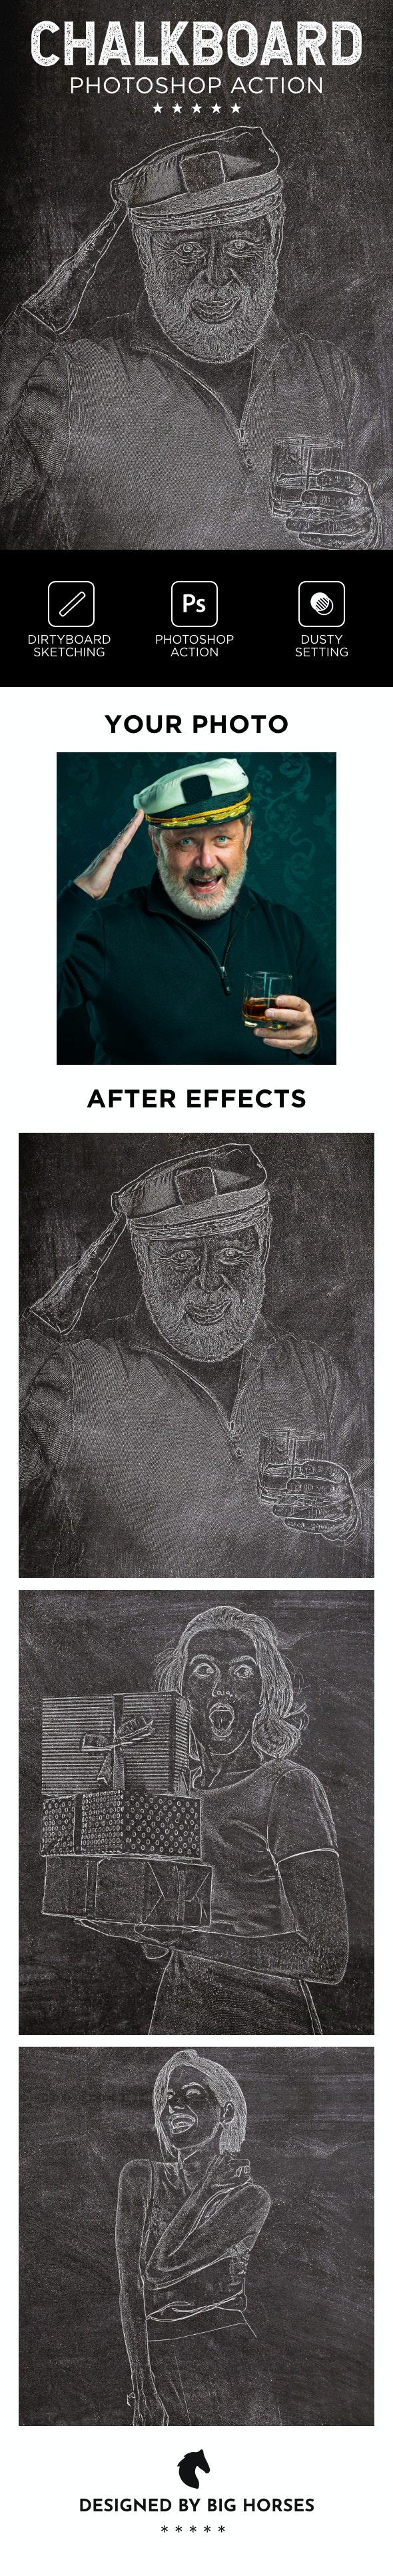 Chalkboard Photoshop Action - Actions Photoshop